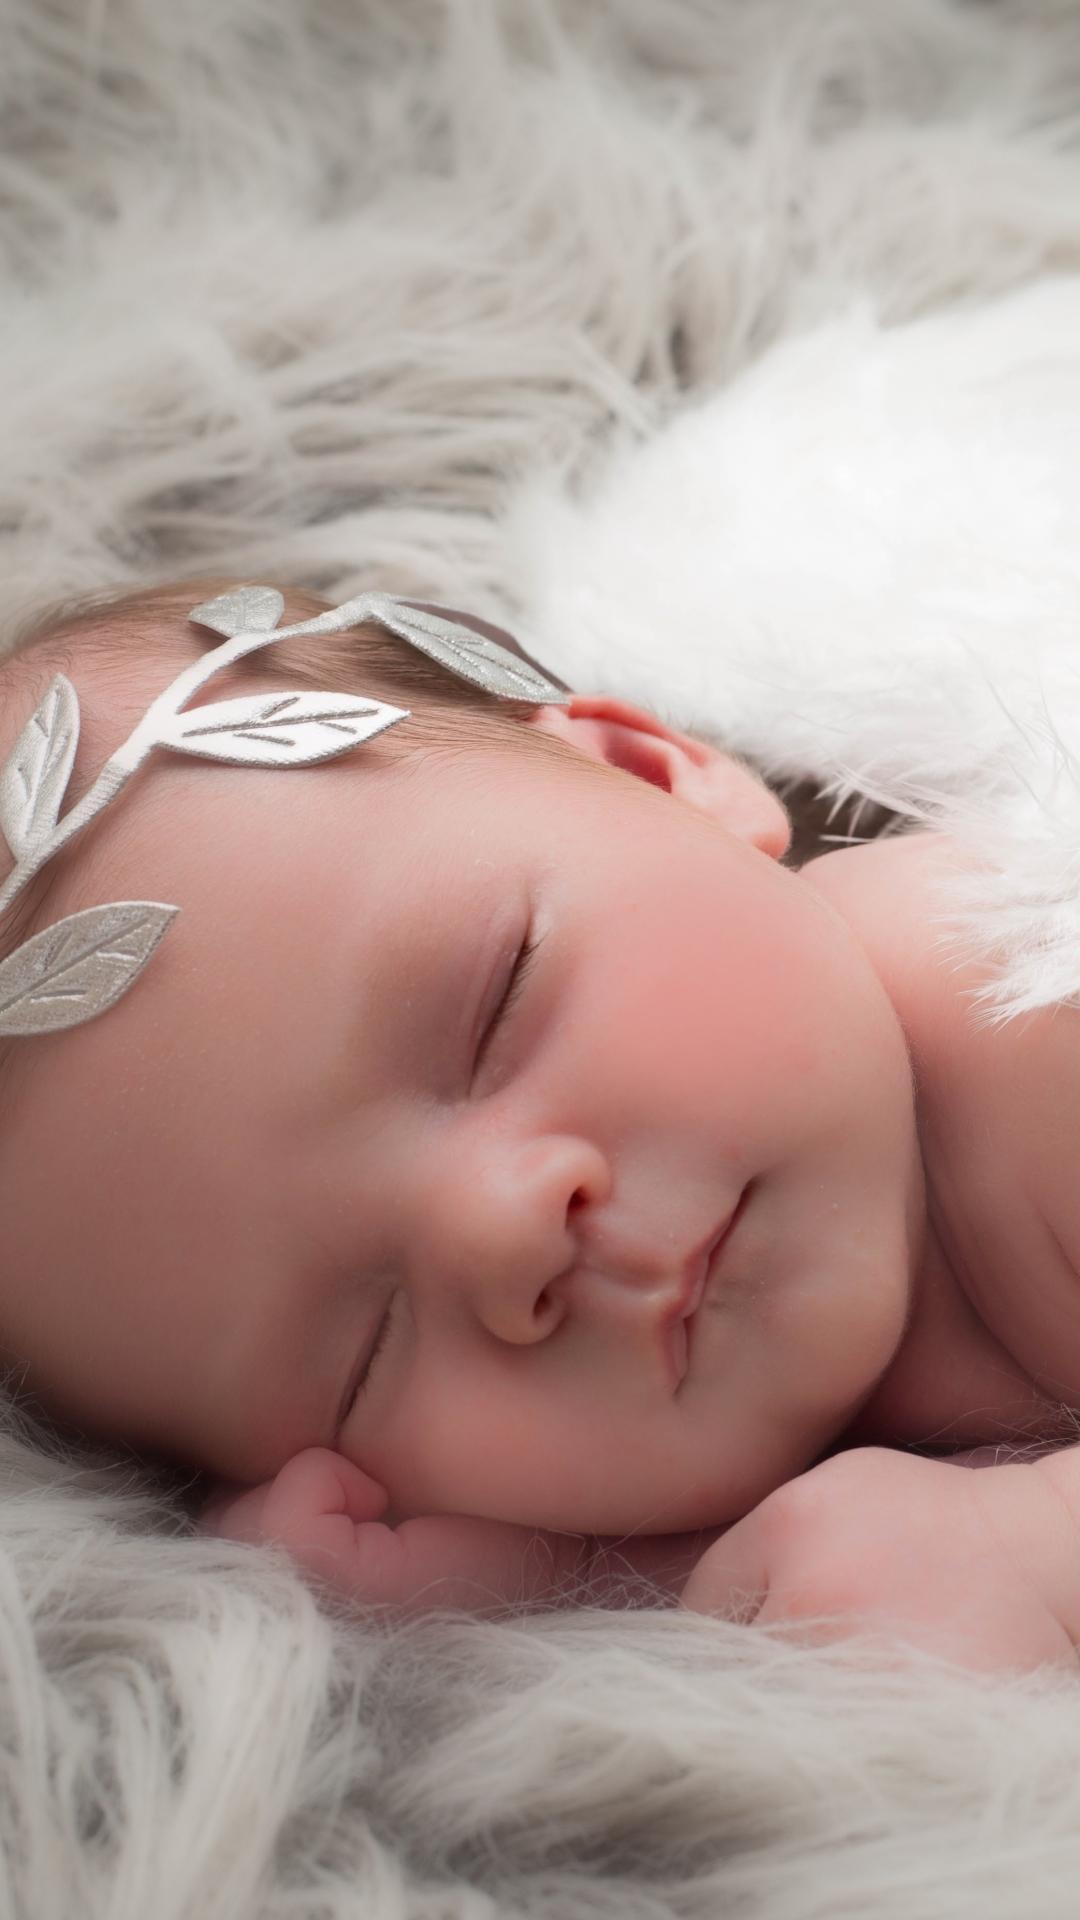 Sleeping Baby Wallpaper